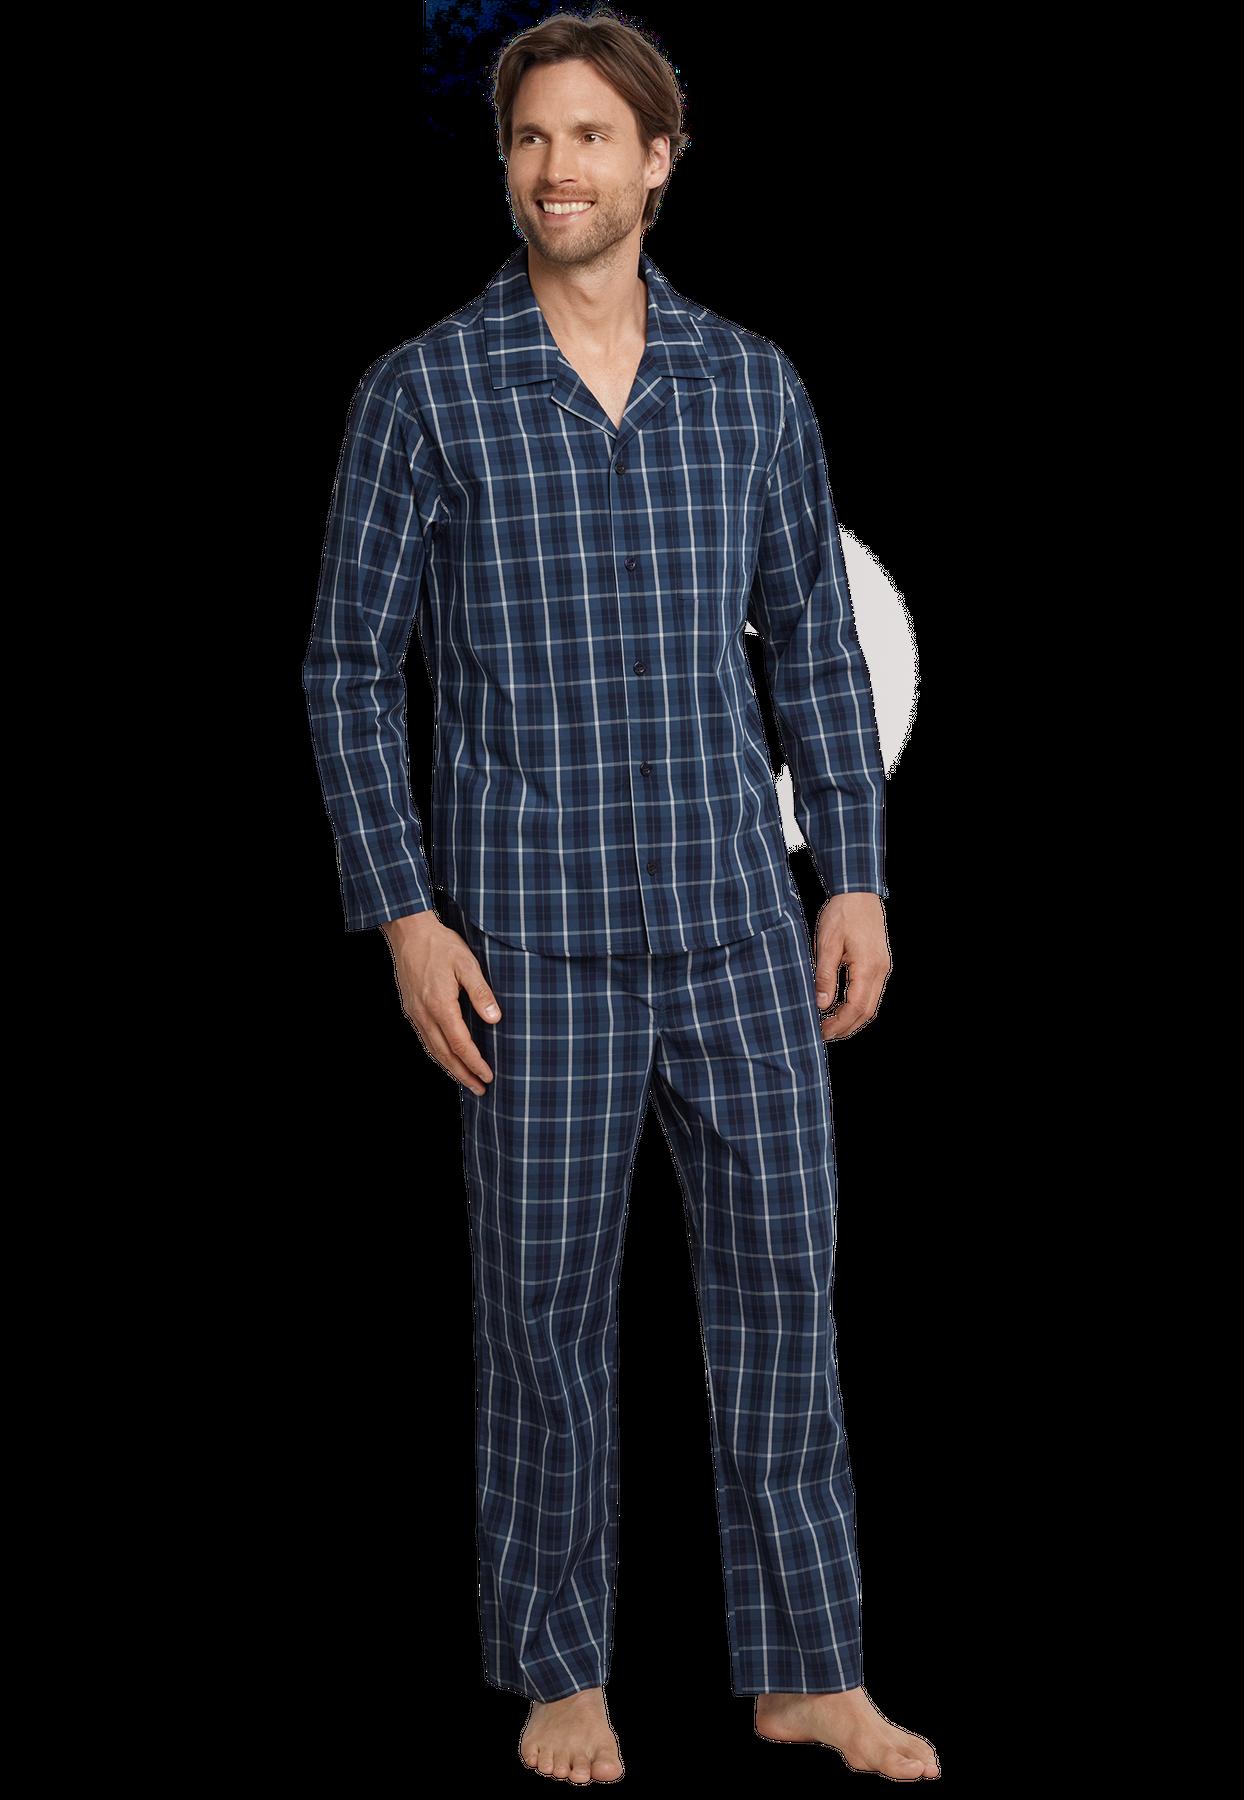 Seidensticker - Herren Pyjama lang, blau (159004) – Bild 1